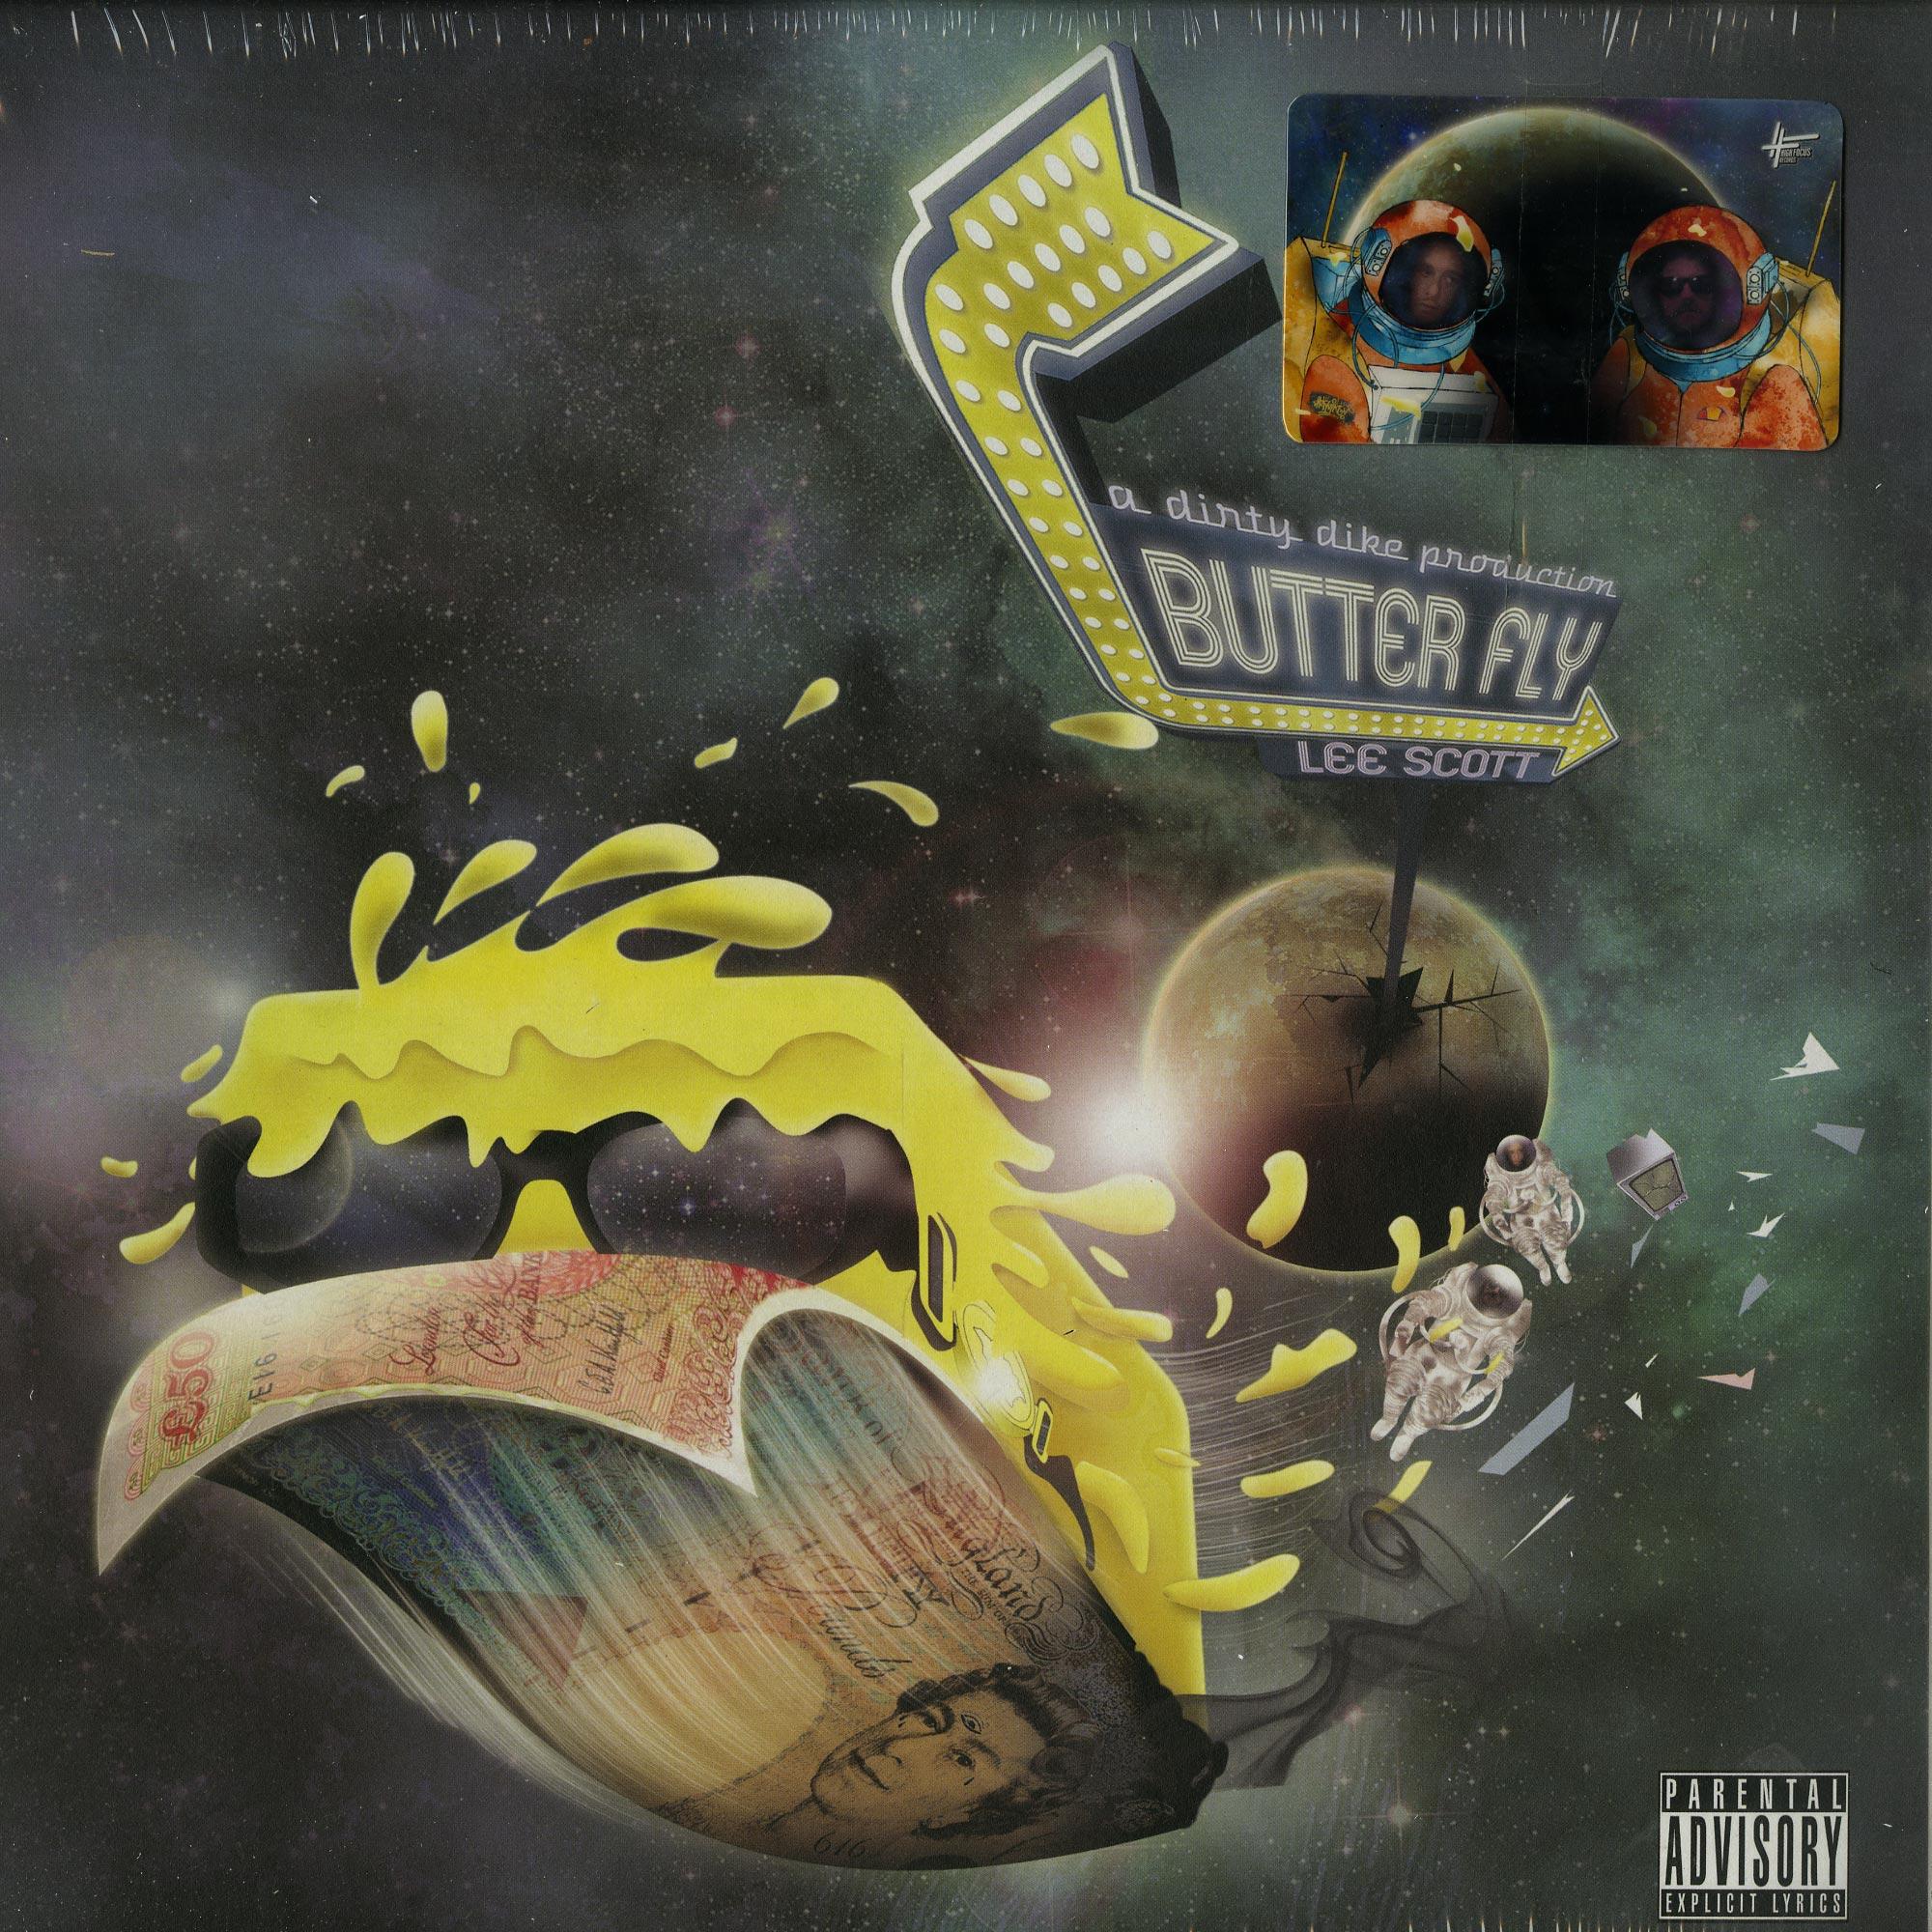 Lee Scott - BUTTER FLY